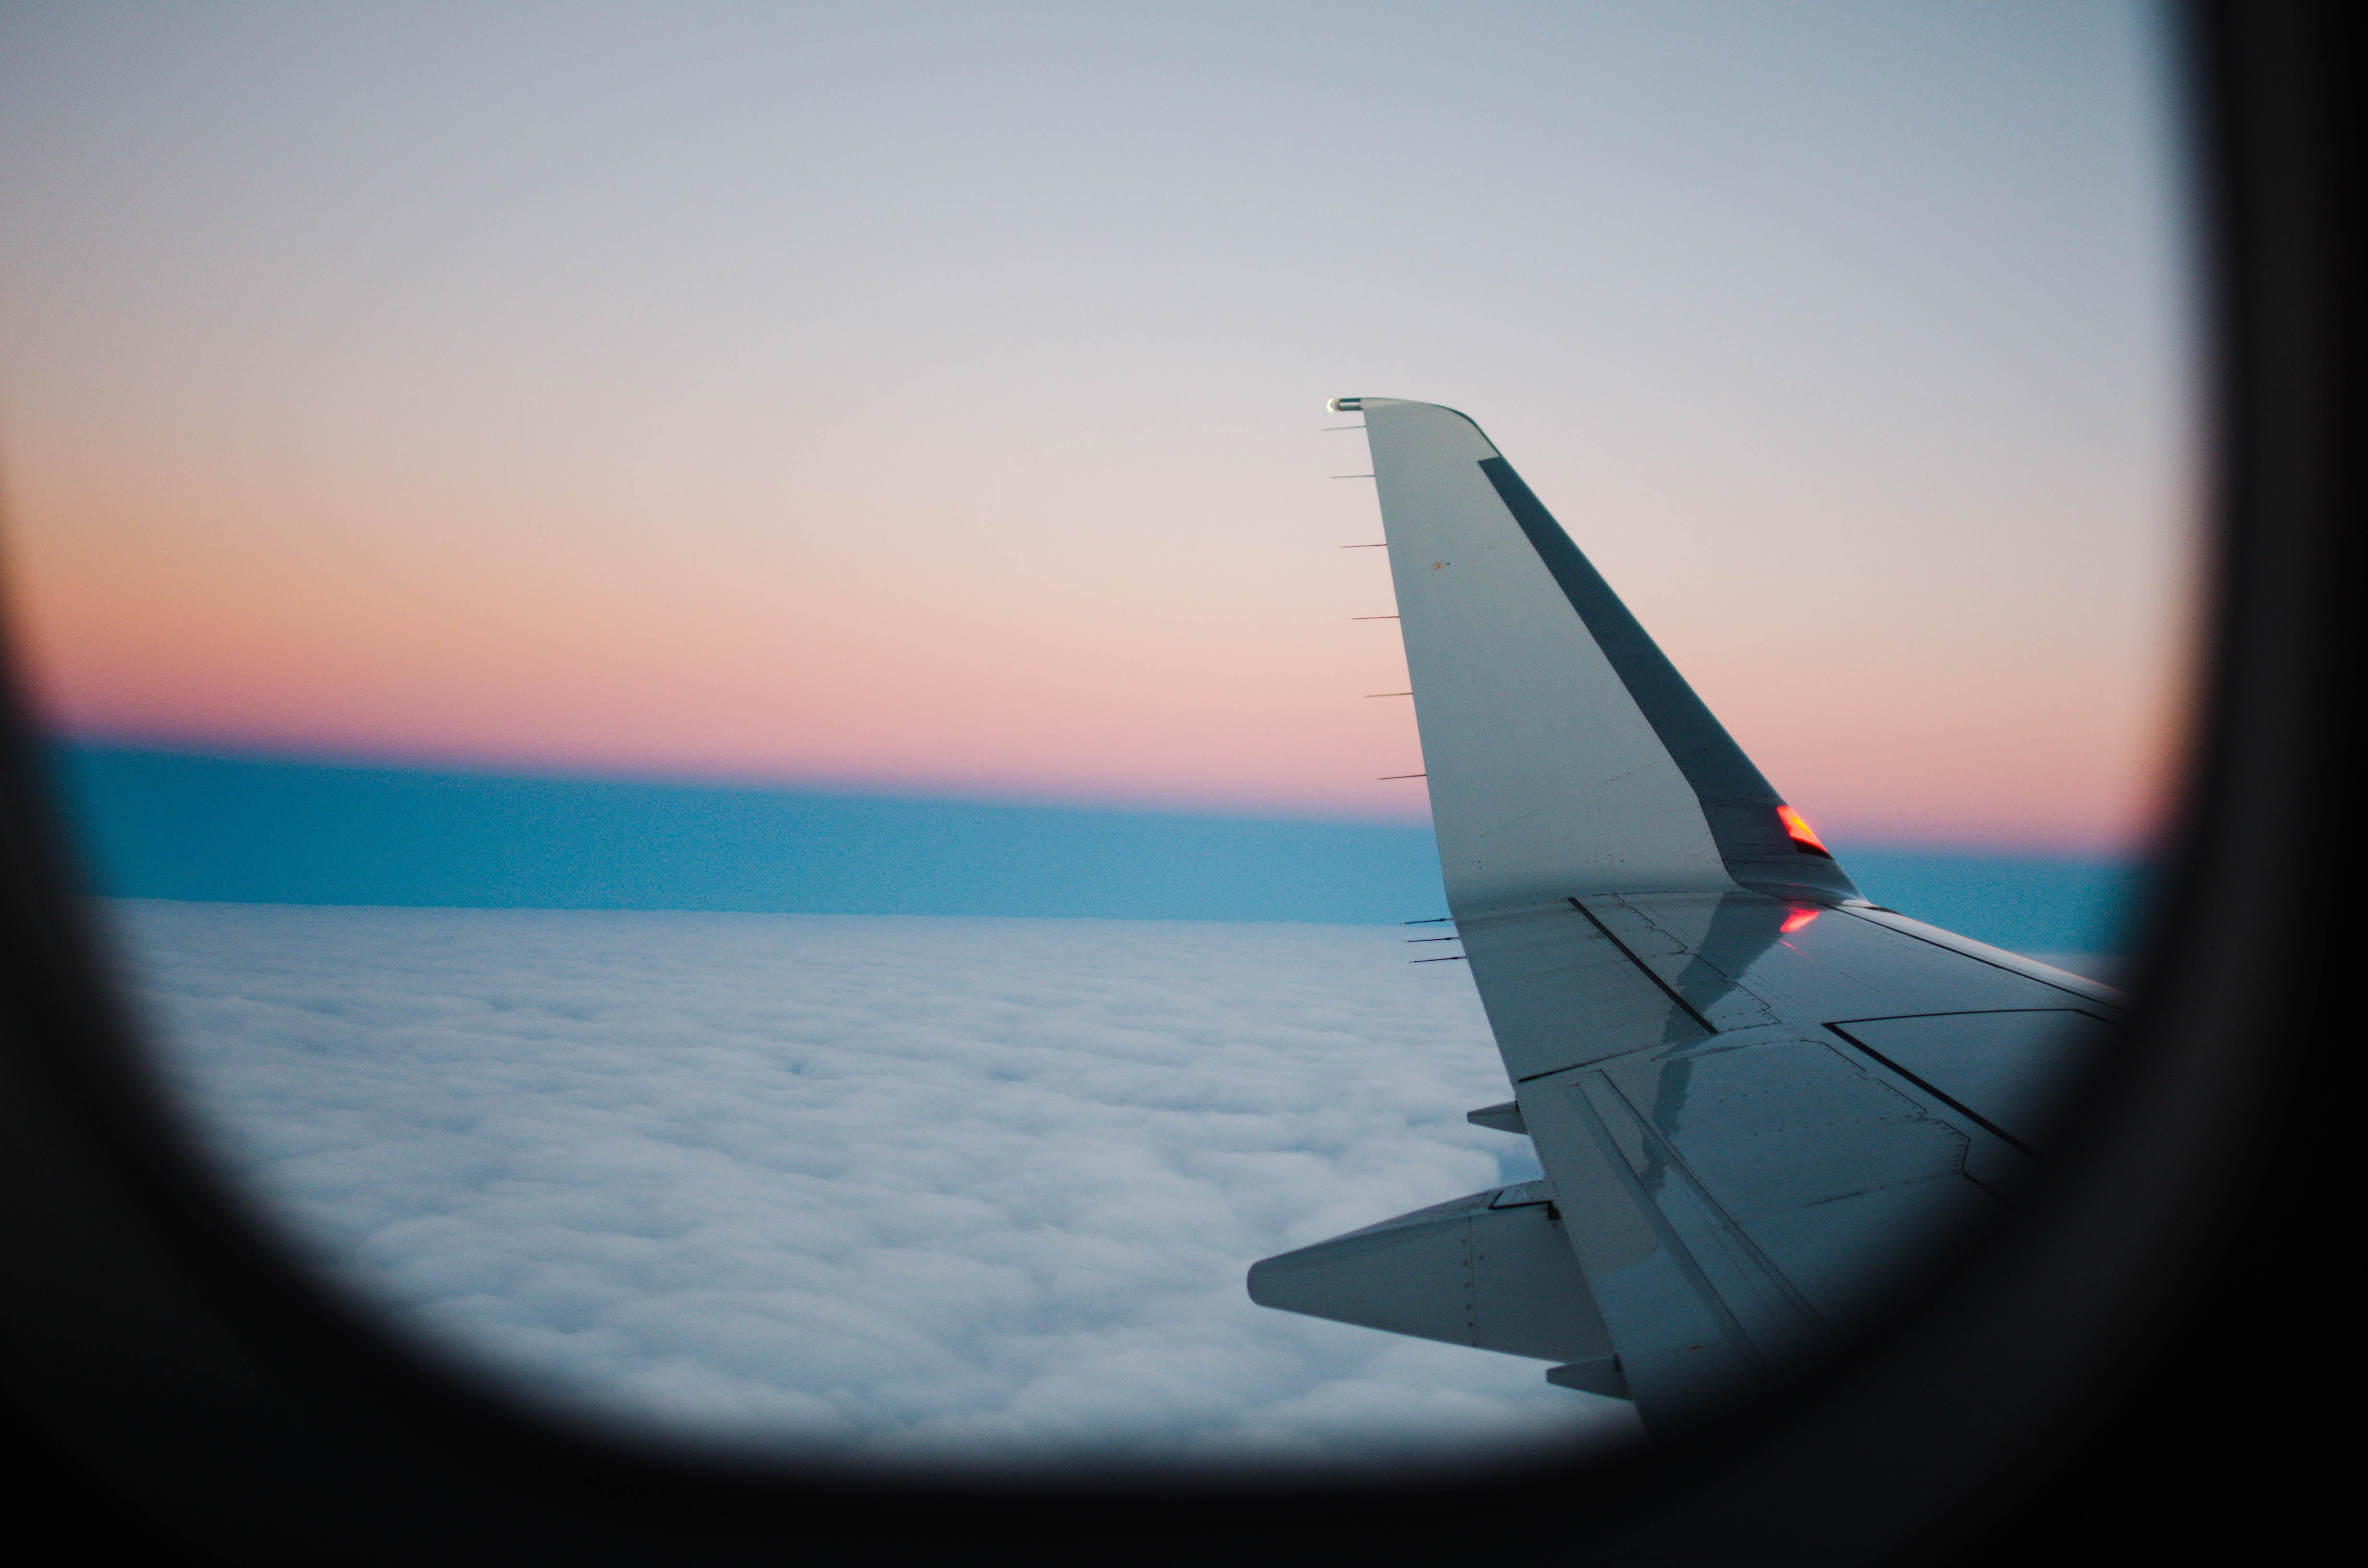 39,000 feet